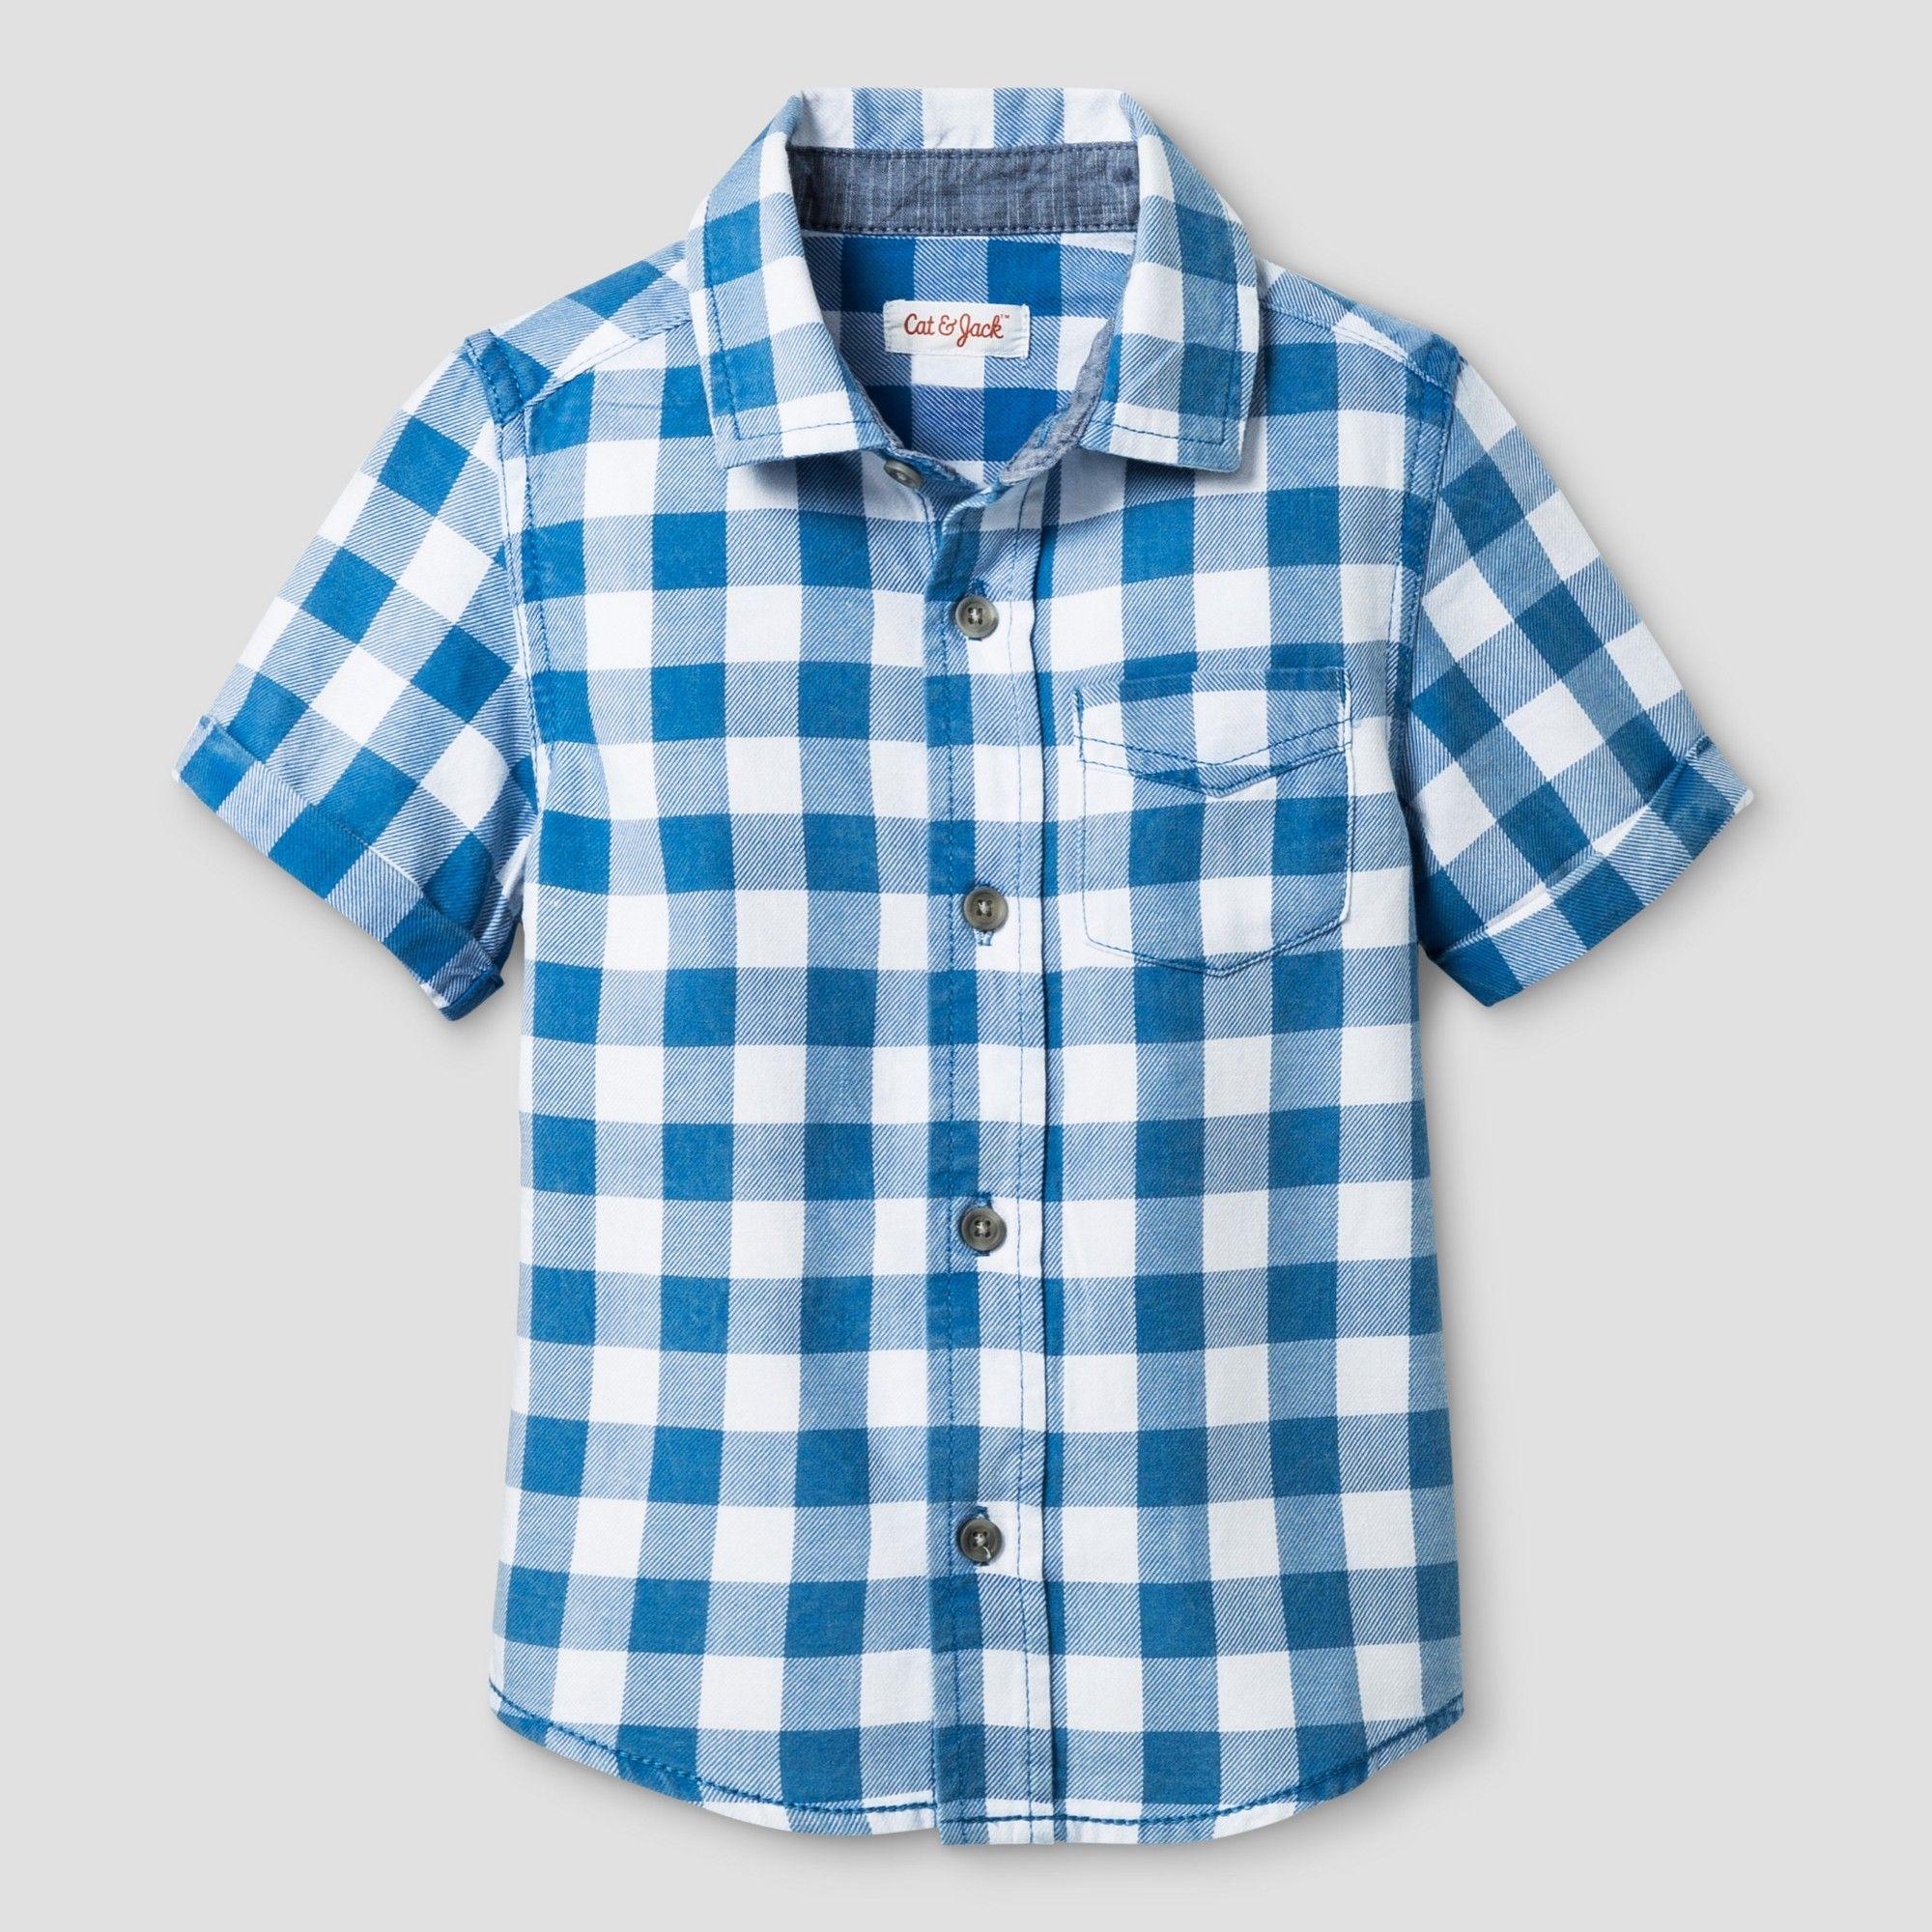 c5a35390 Toddler Boys' Checks Short Sleeve Woven Shirt Cat & Jack Blue 4T ...